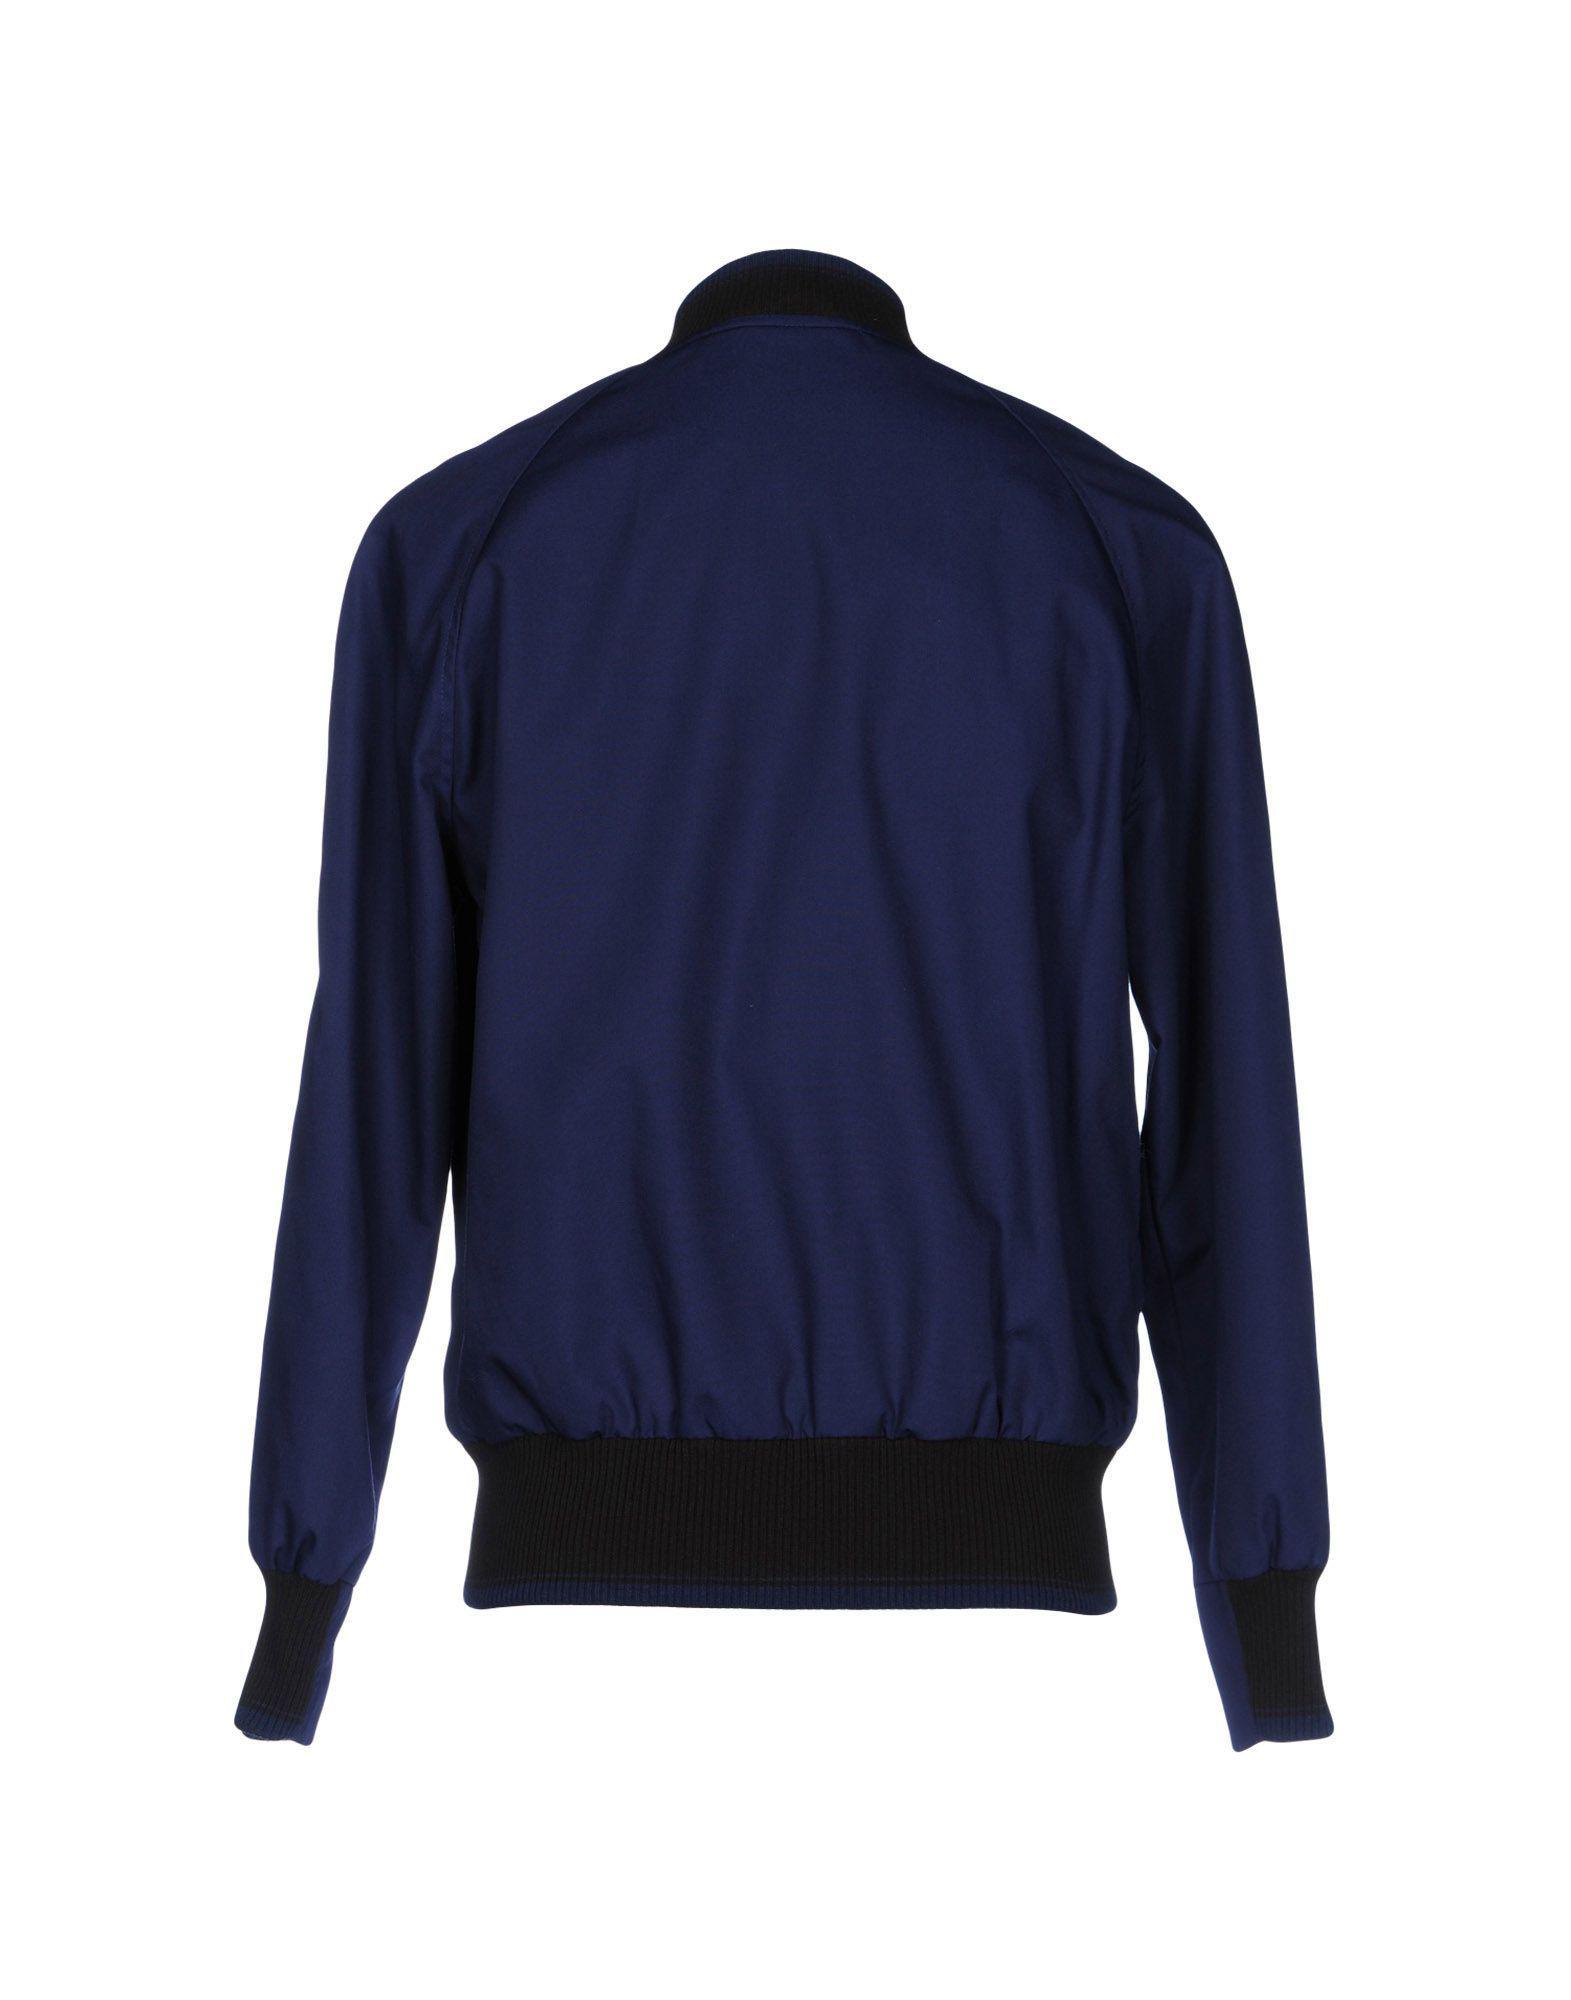 Club Monaco Leather Jacket in Blue for Men